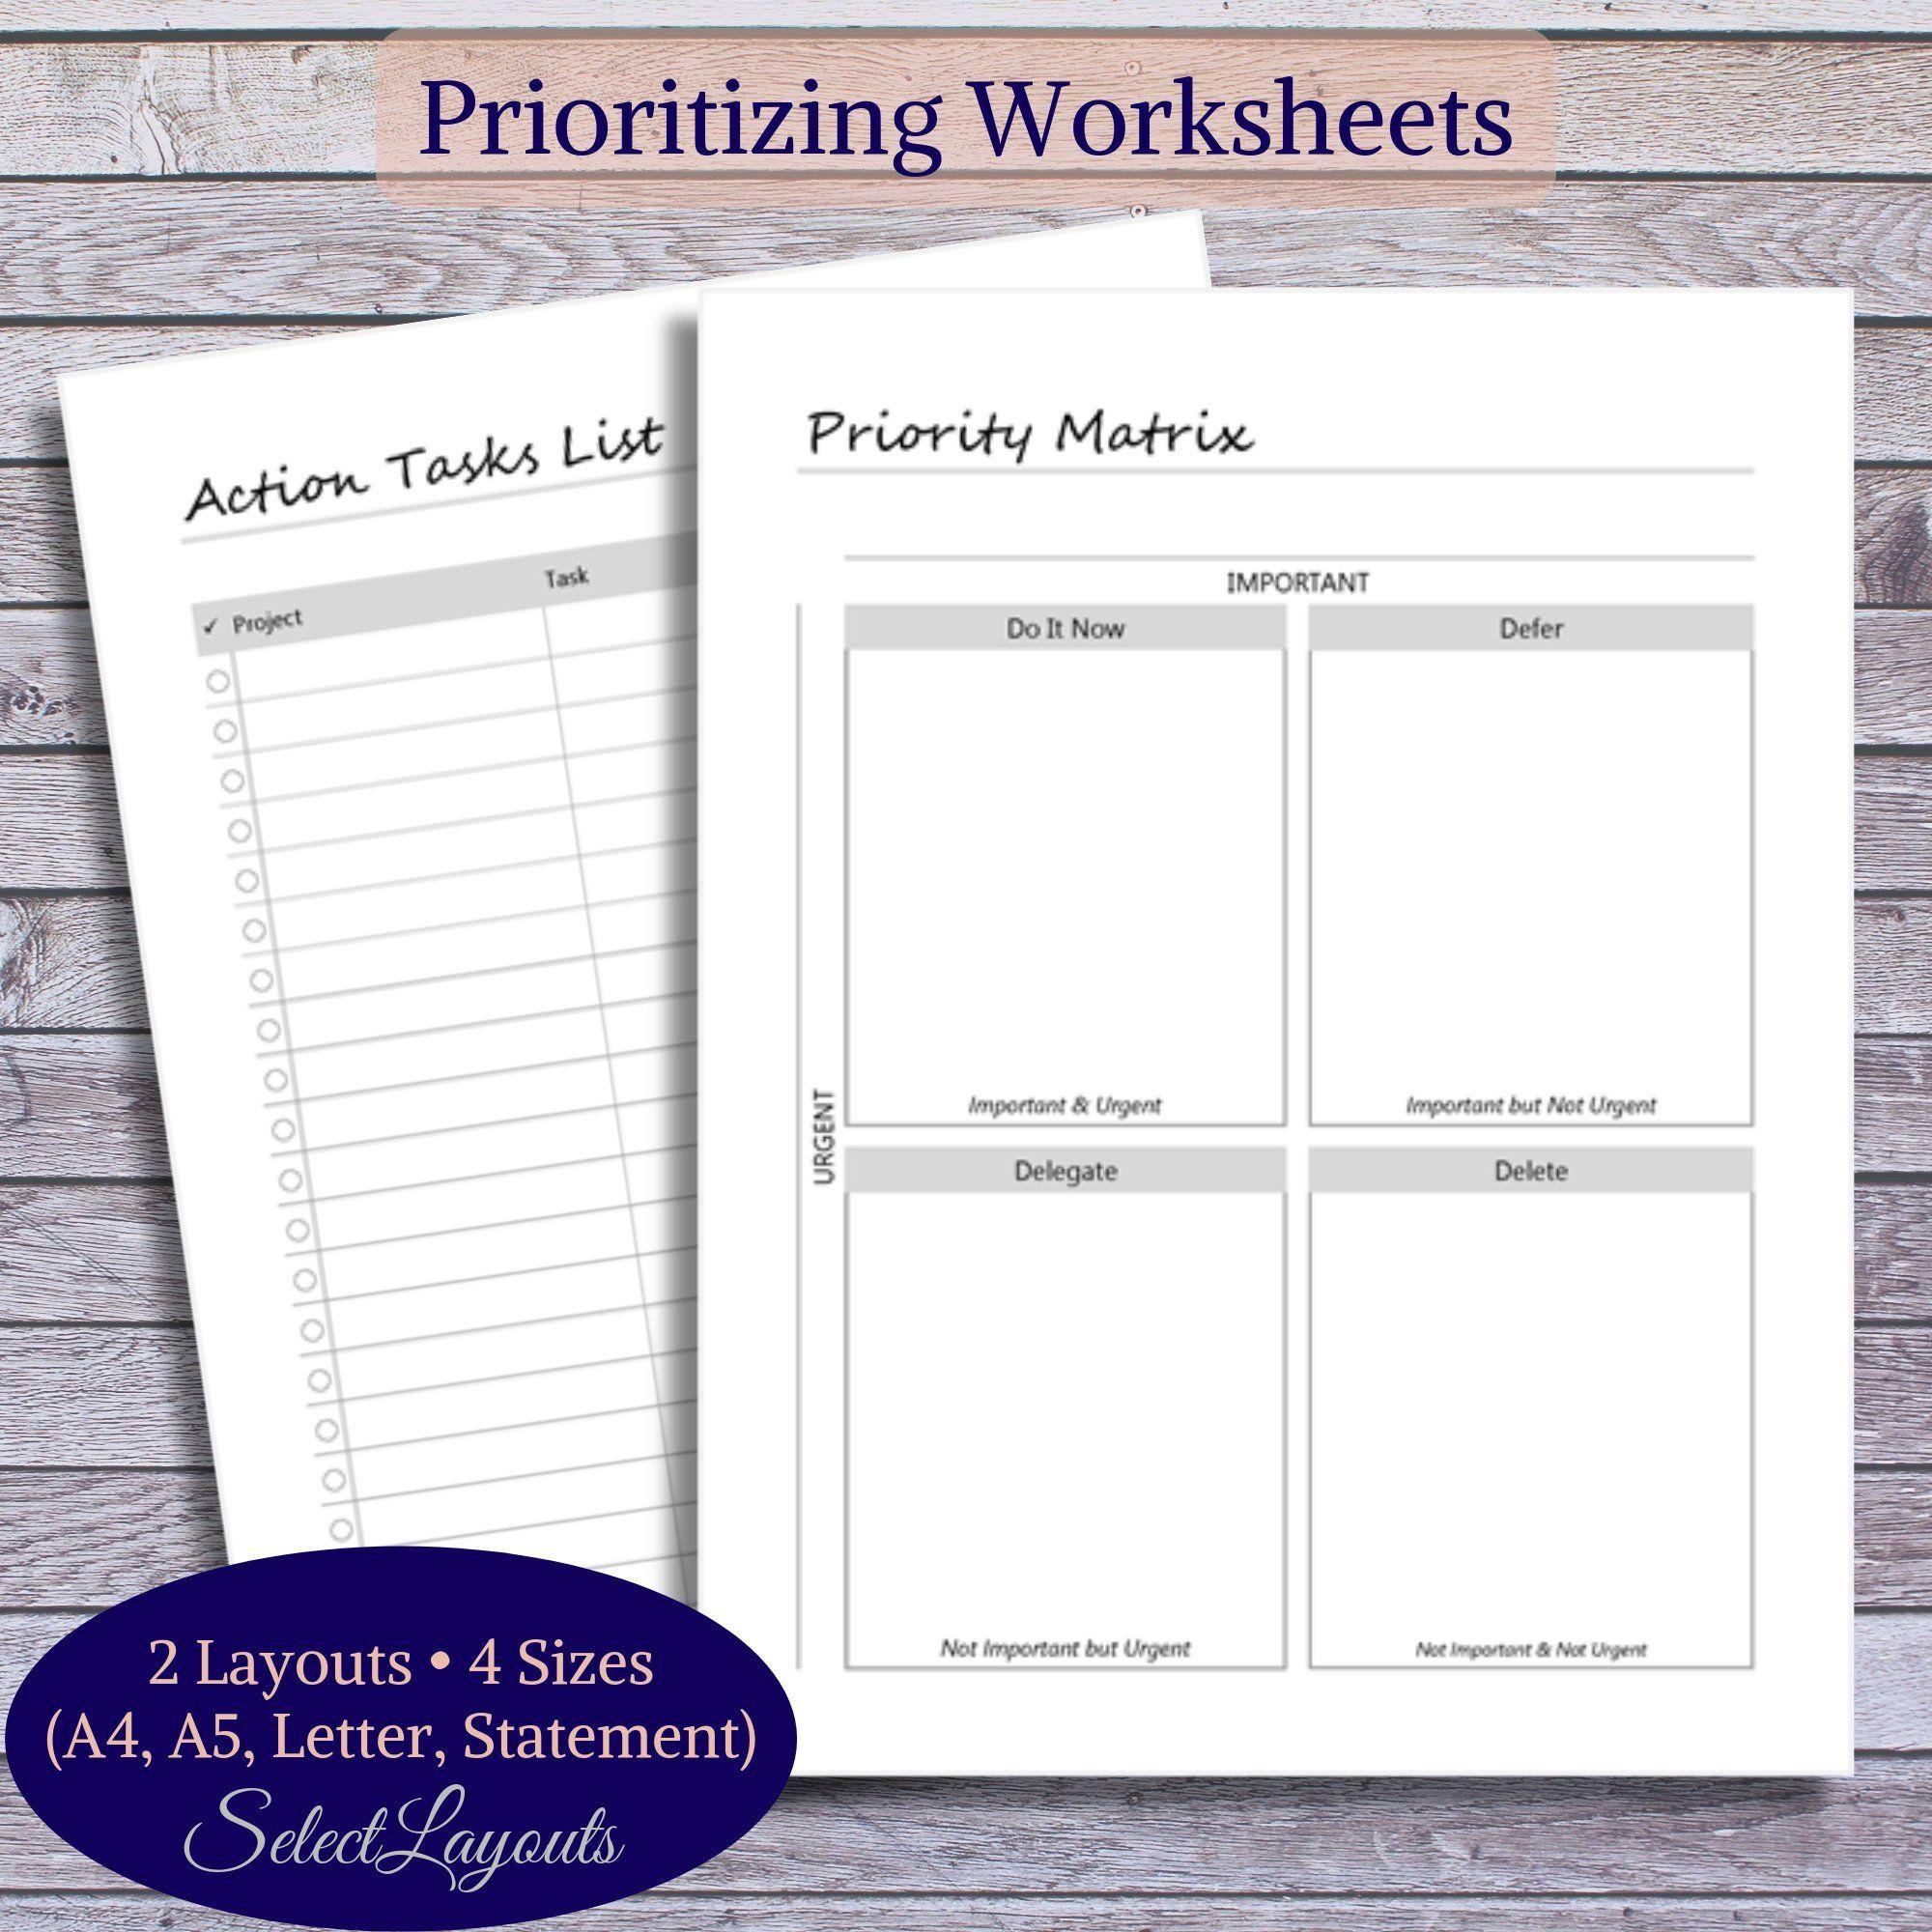 Prioritizing Worksheets Productivitiy Planner Printable Pdf Template Time Management Tools Smart Goals Worksheet Worksheets